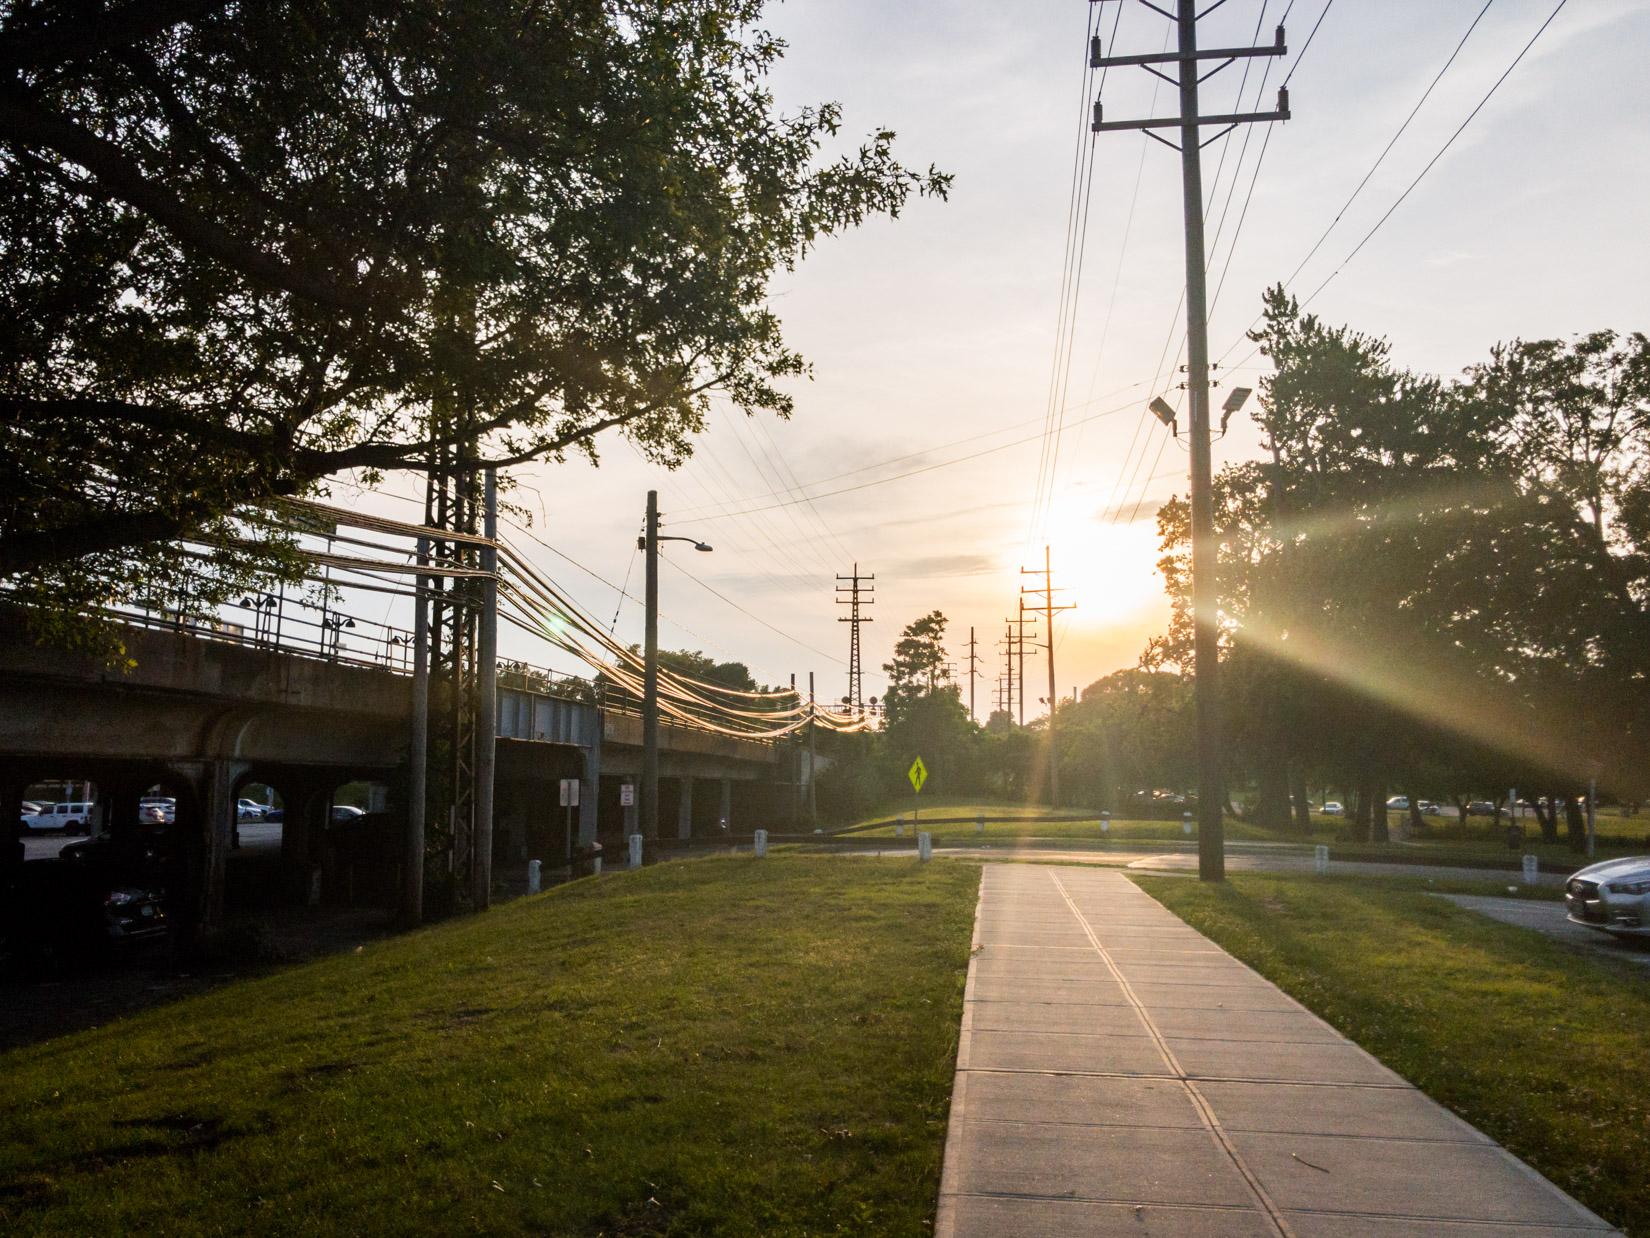 Sun Above Sidewalk and Train Station